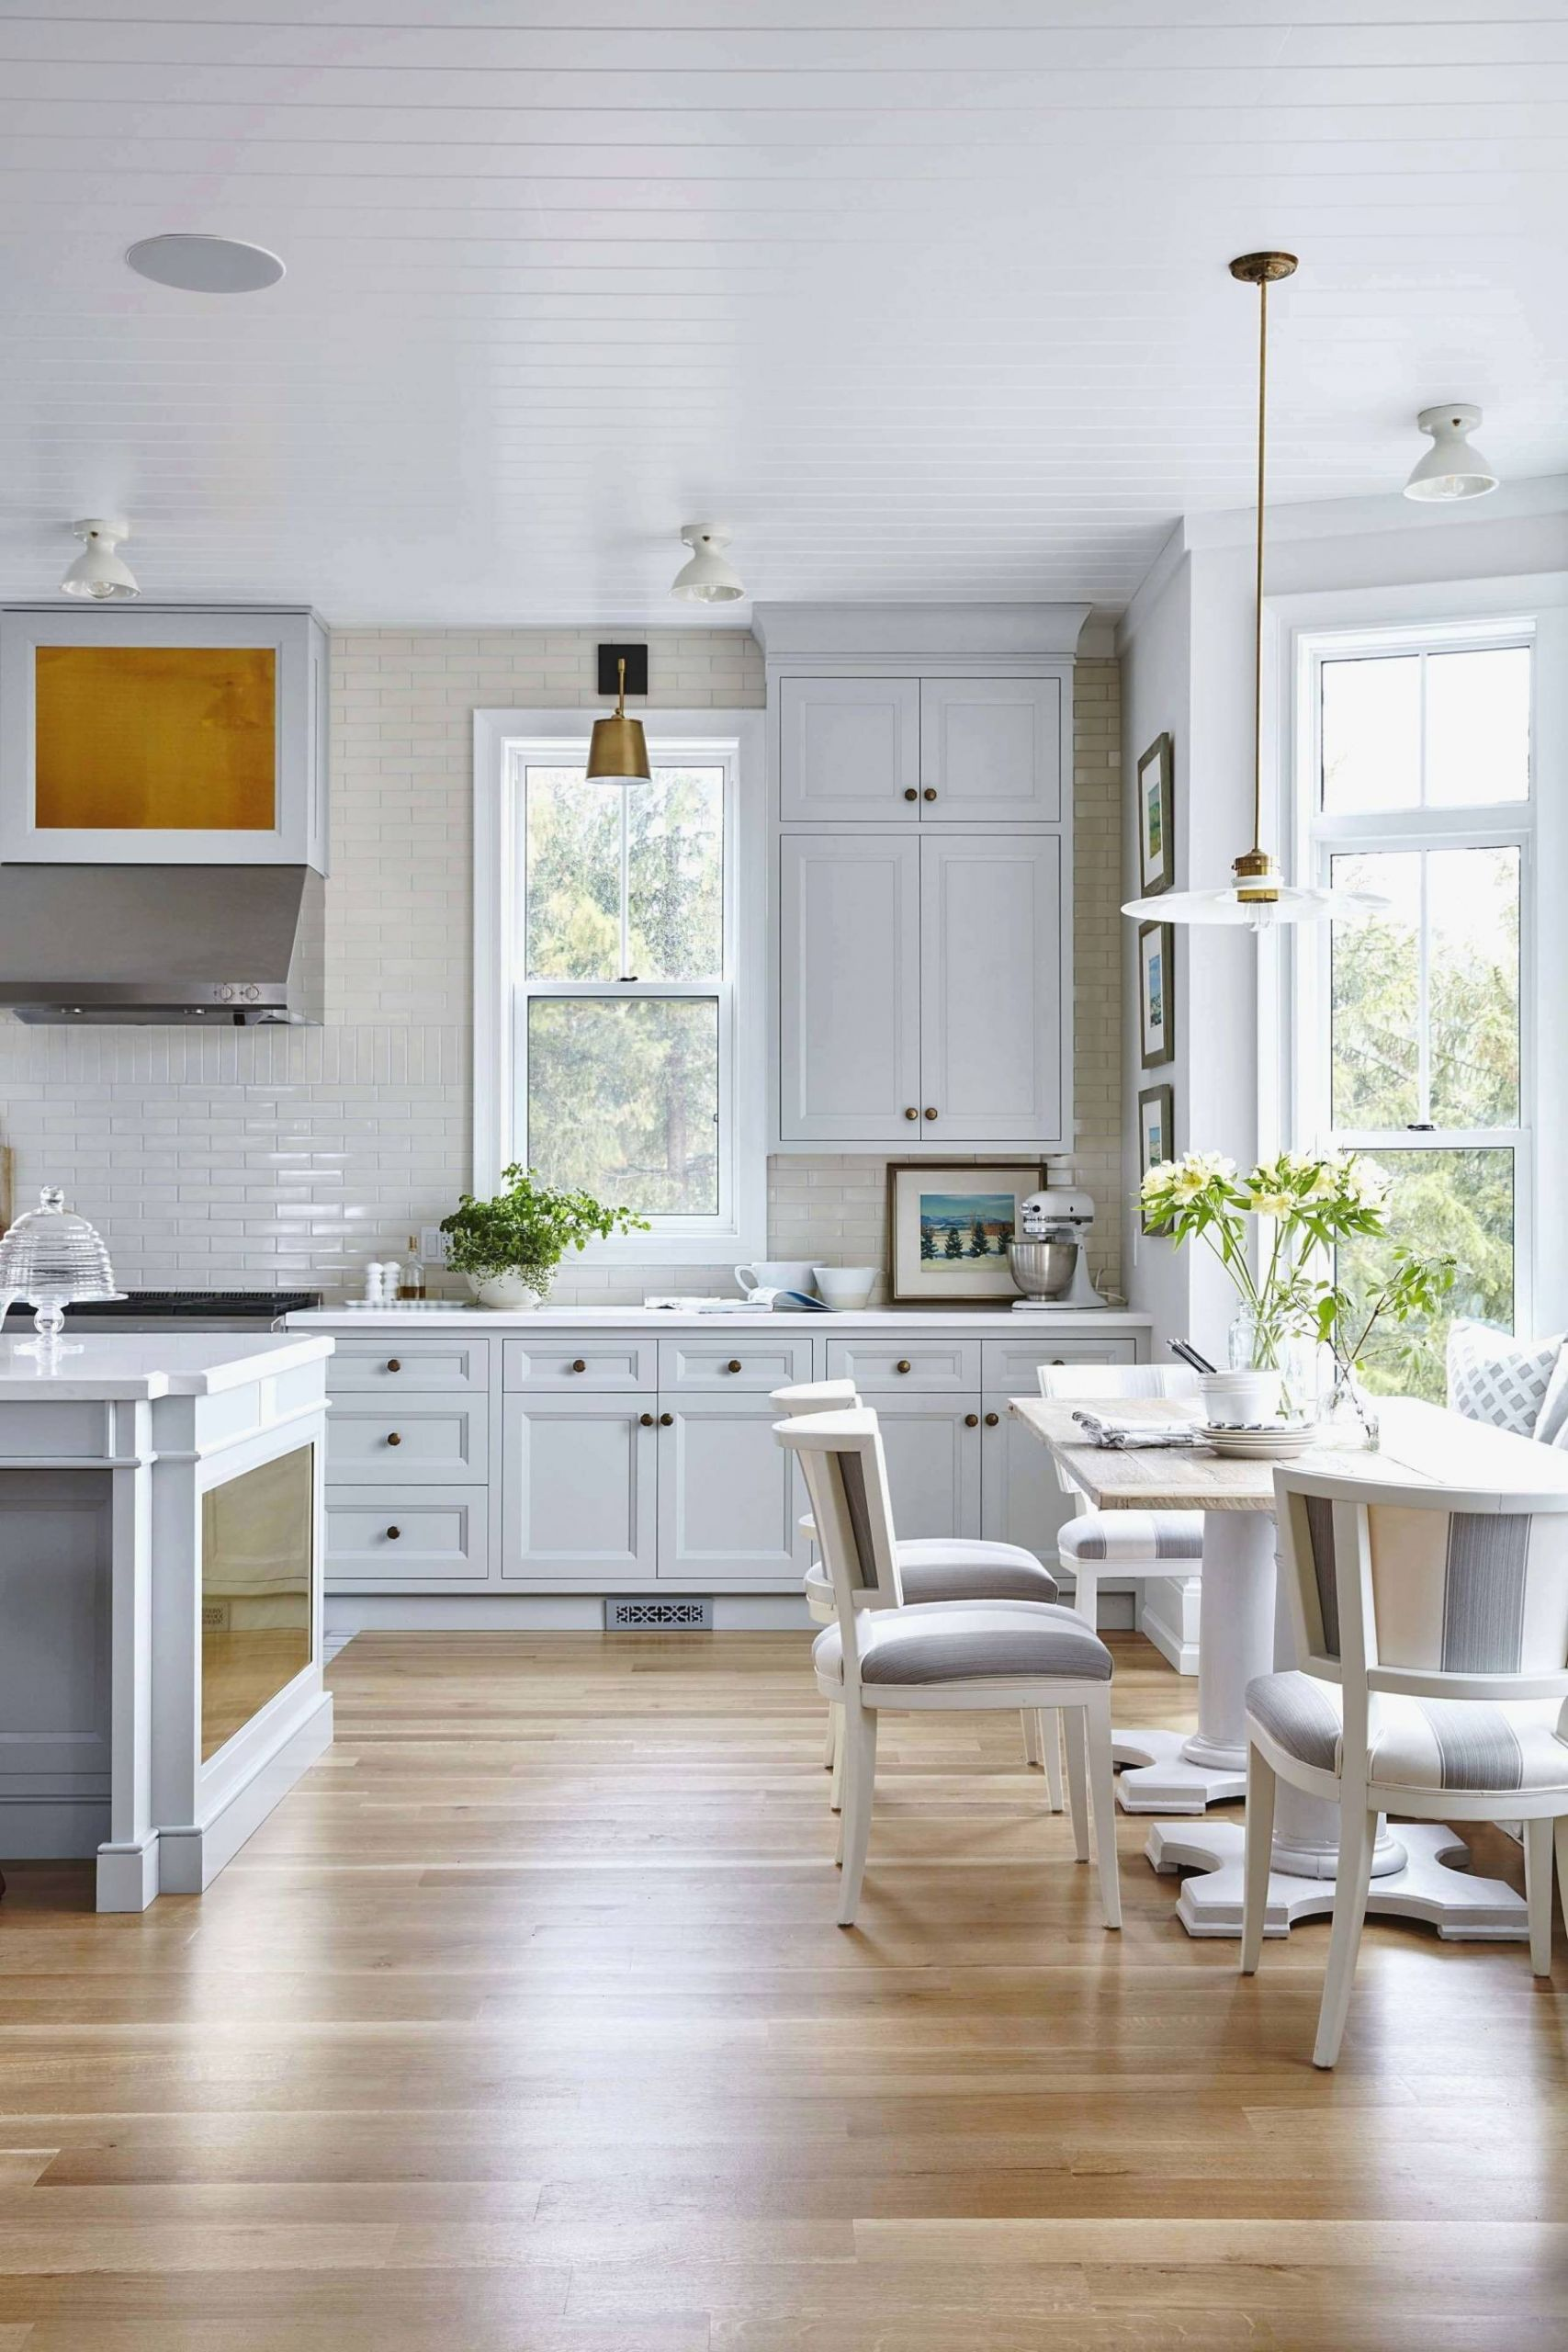 ebay hardwood flooring of 15 ebay kitchen cabinets for sale collection umfilipequalquer throughout kitchen cabinet planner awesome kitchen design layout kitchen island decoration 2018